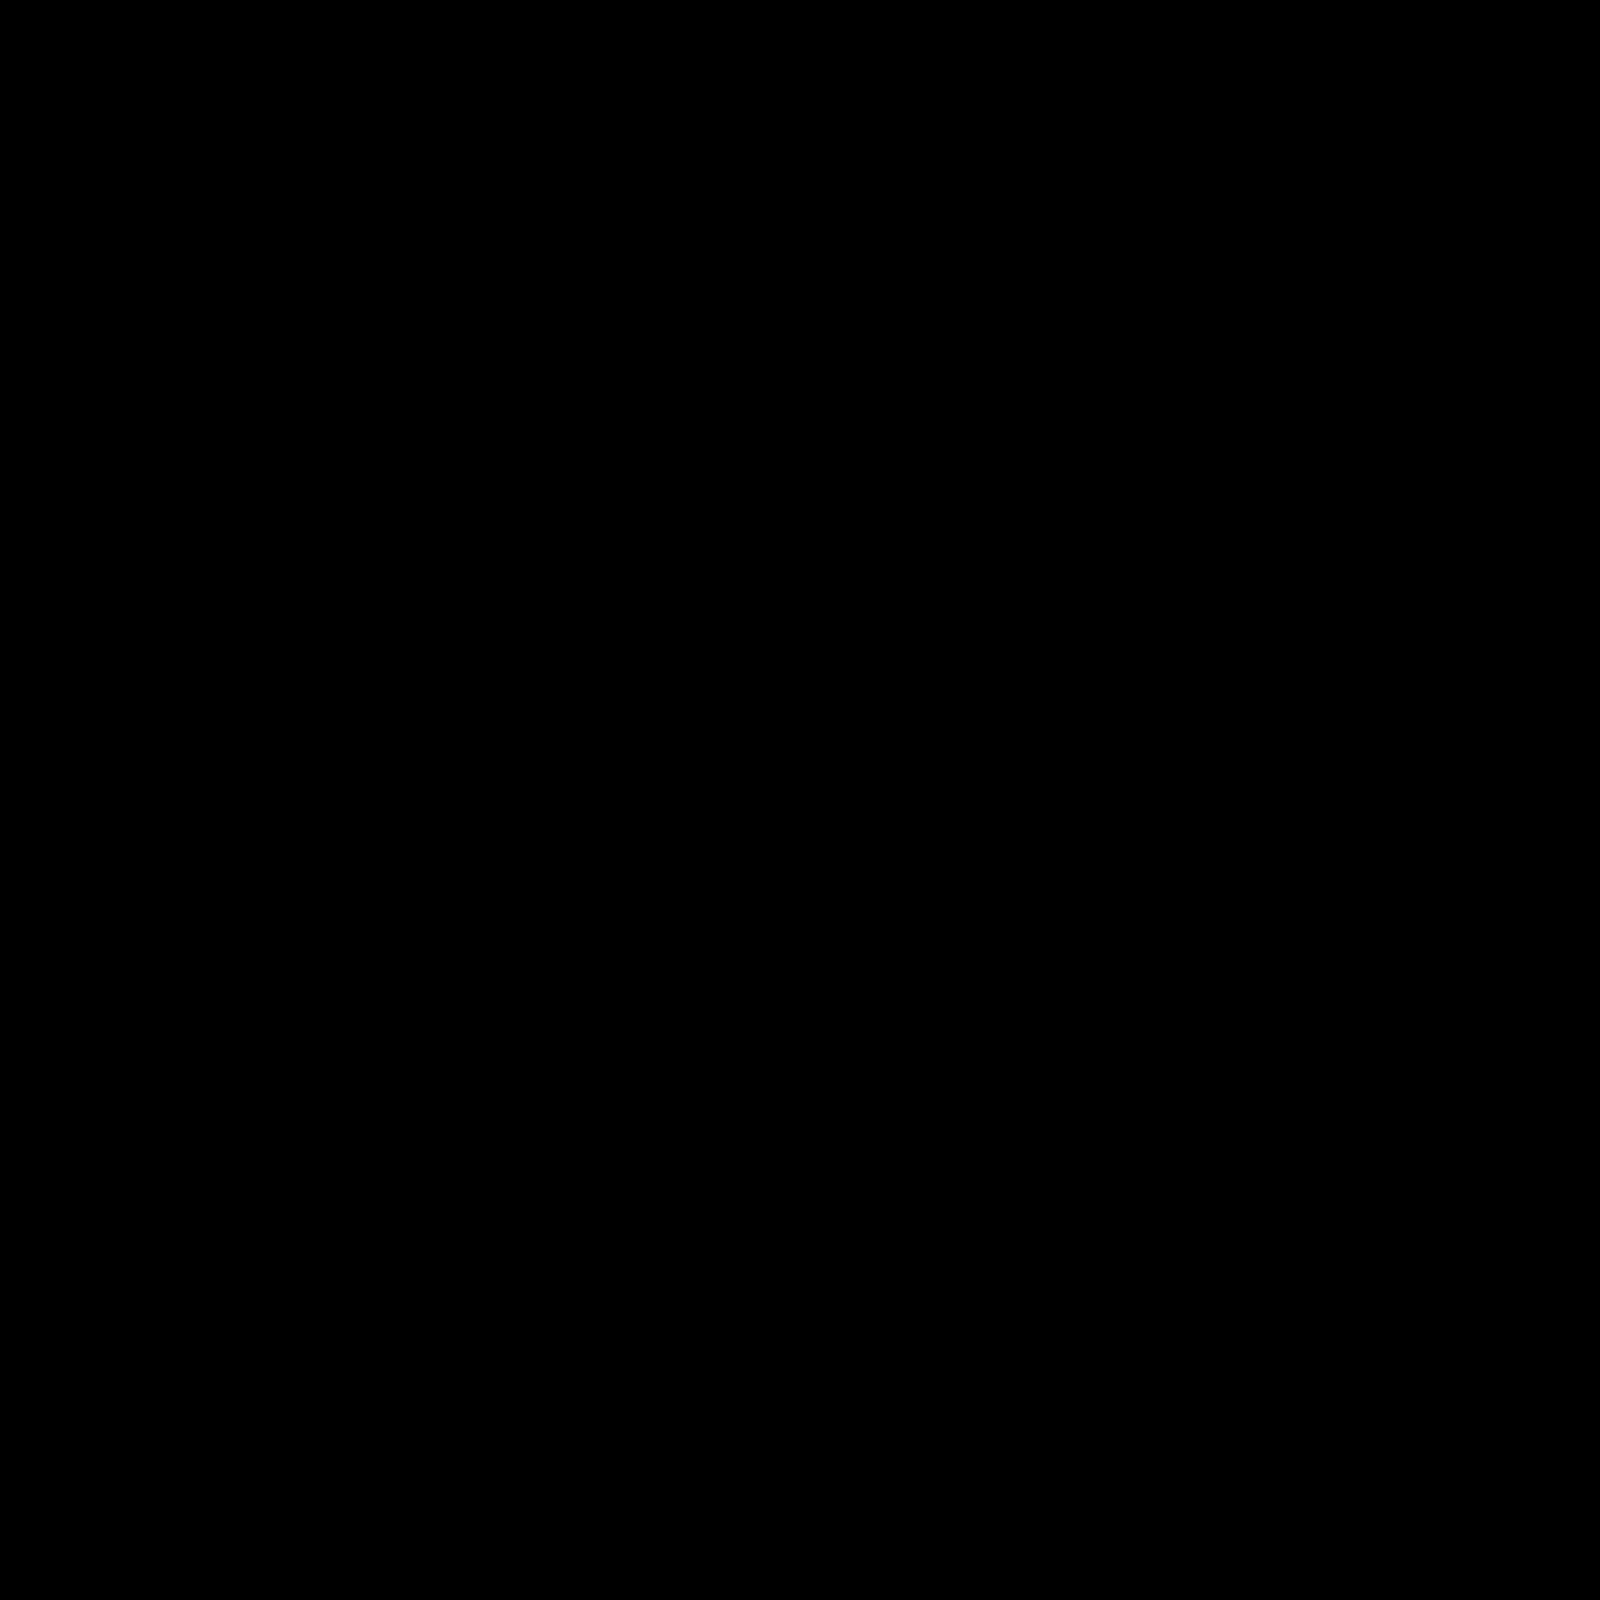 4 000x4 000 Isometric Grid By Dcofjapan On Deviantart Isometric Grid Isometric Deviantart